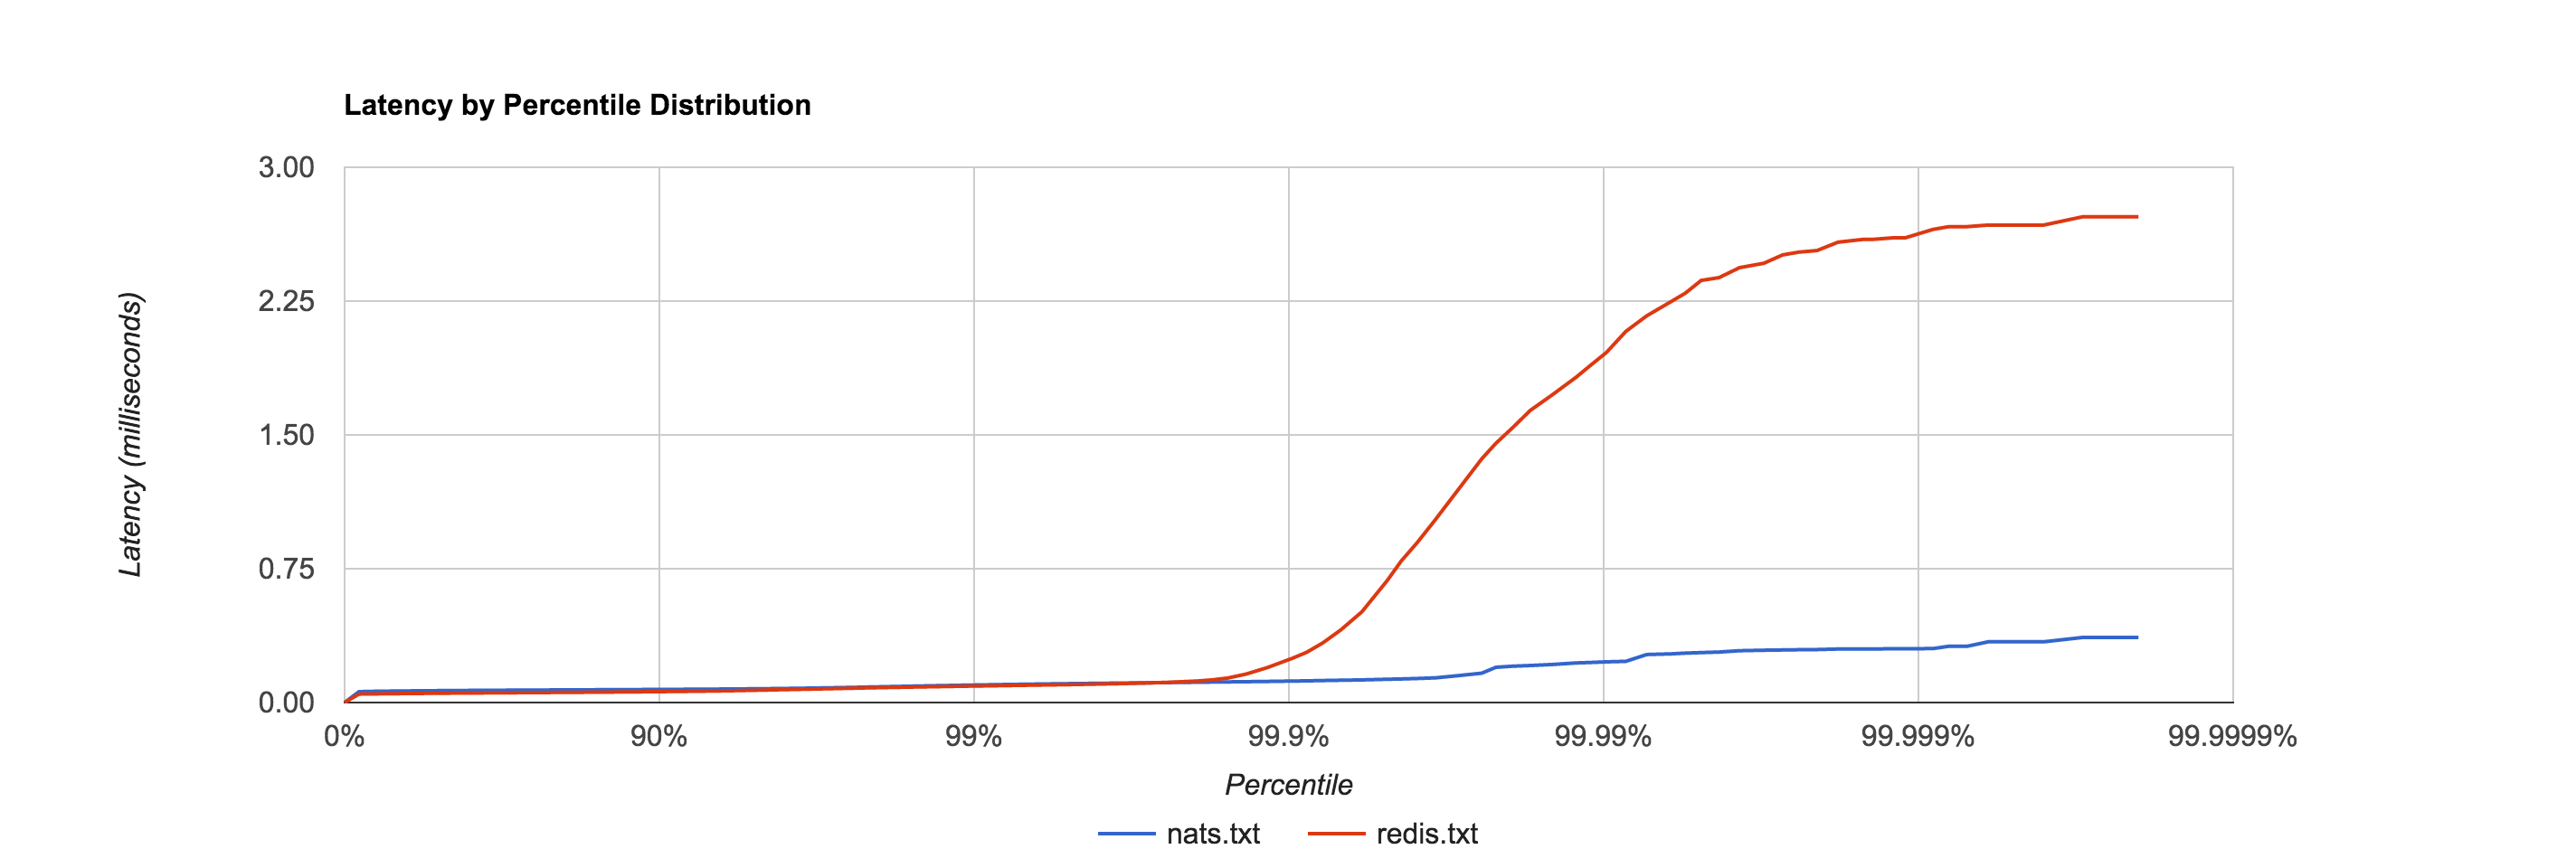 Latency Distribution